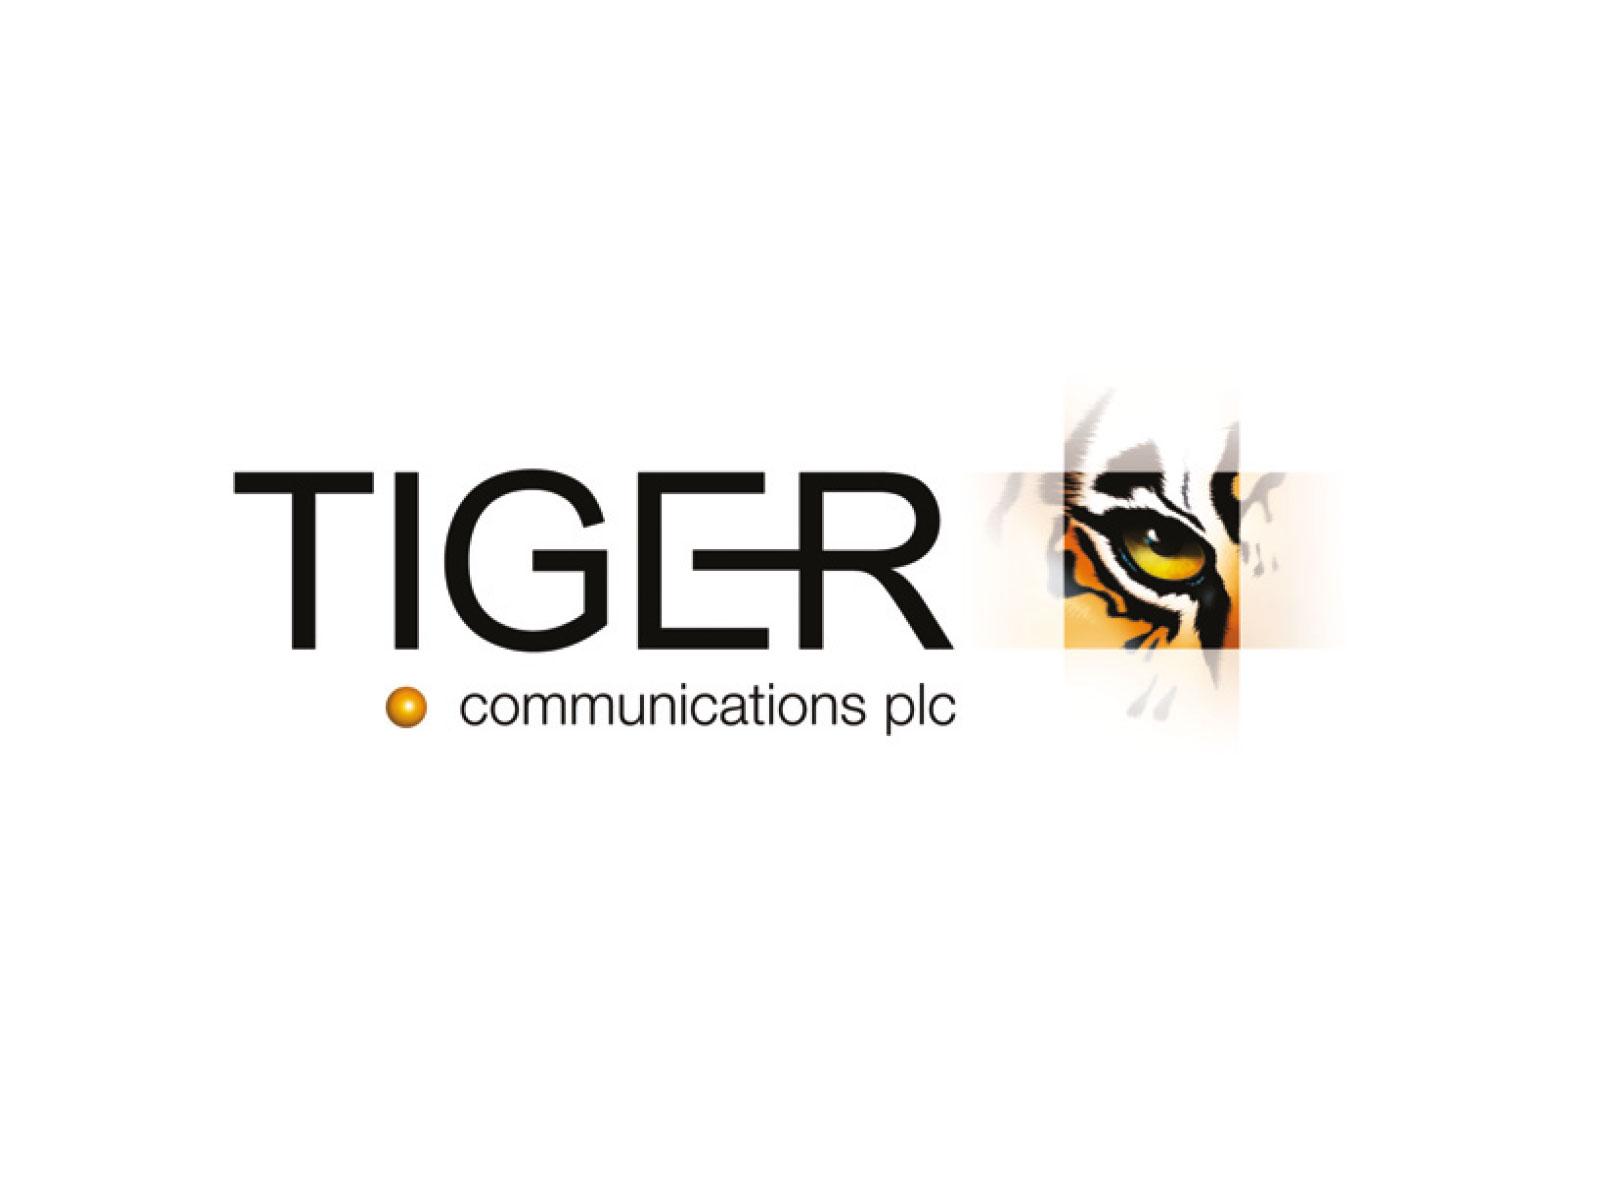 Business Partner Tiger Communications